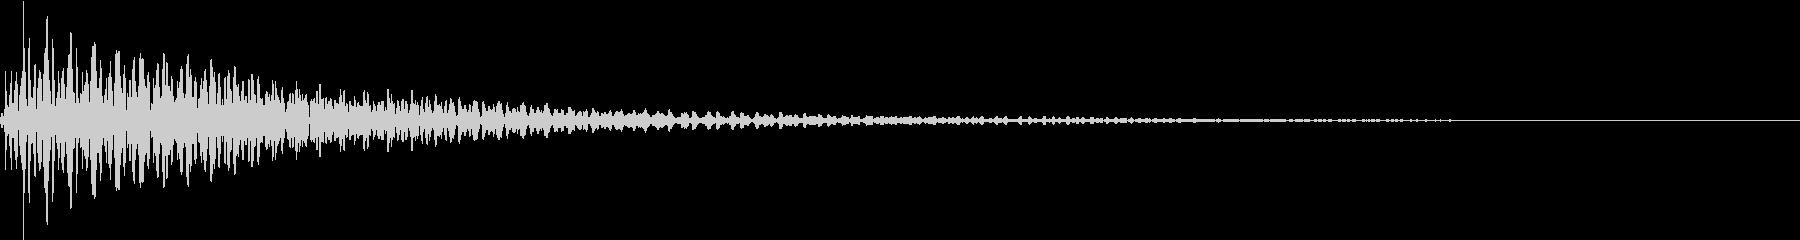 Button 決定ボタン 低音重厚の未再生の波形